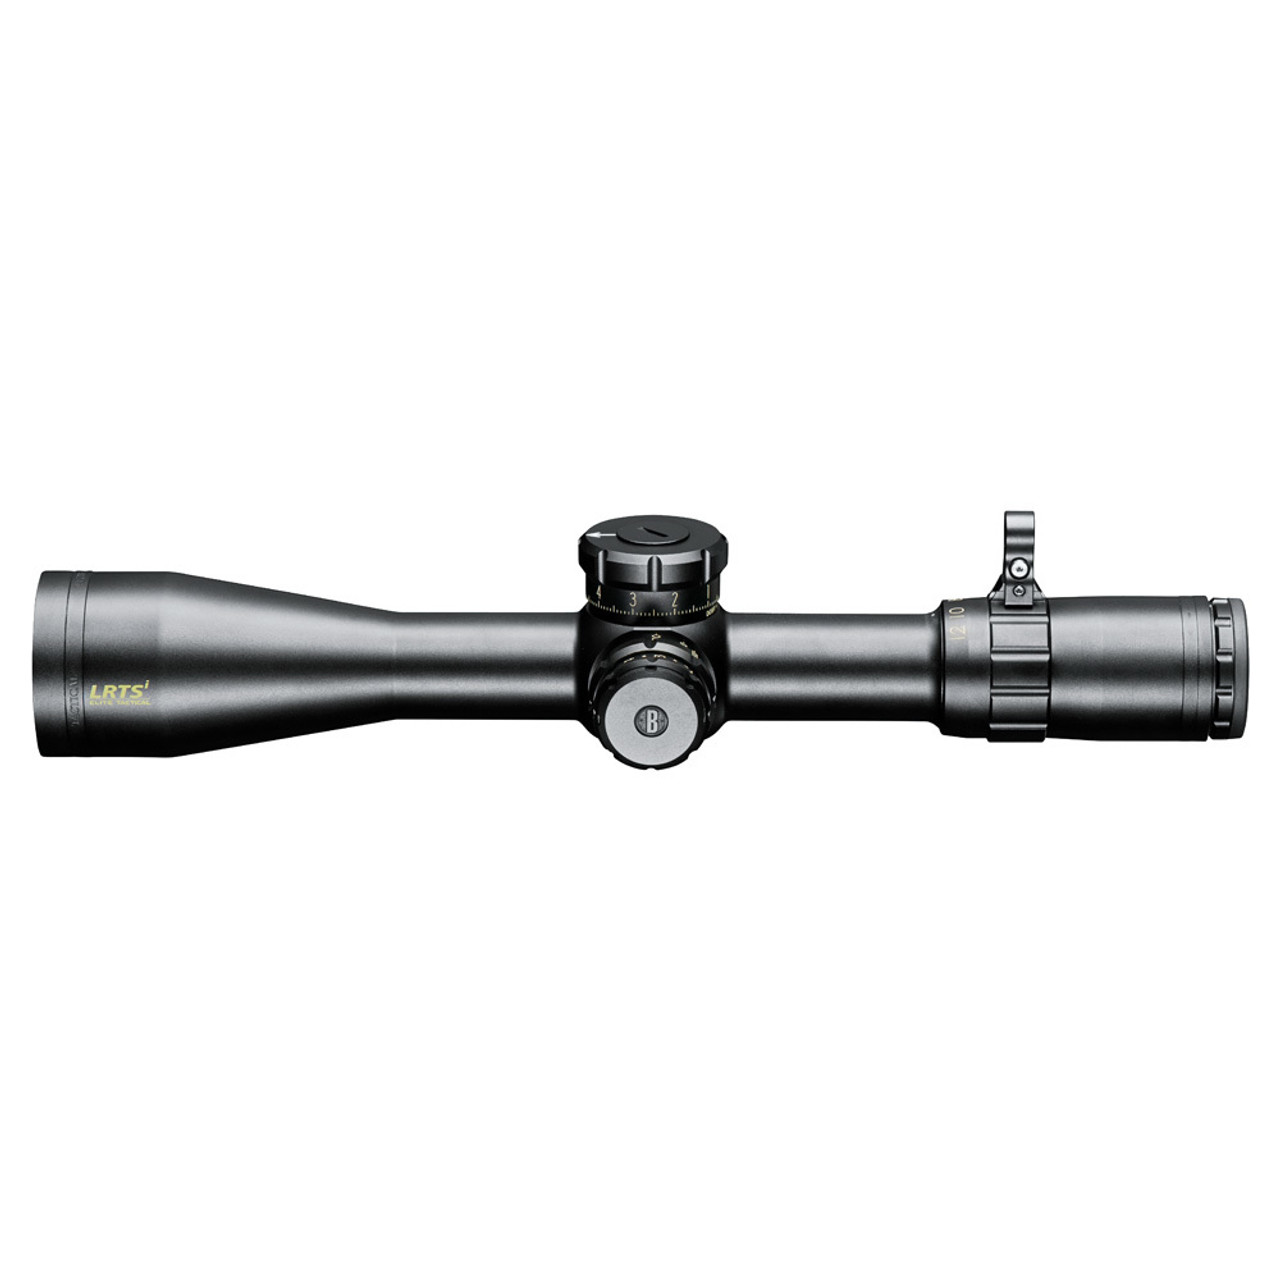 Bushnell Elite Tactical LRTS 3-12x44 Illum G3 FFP Matte Black